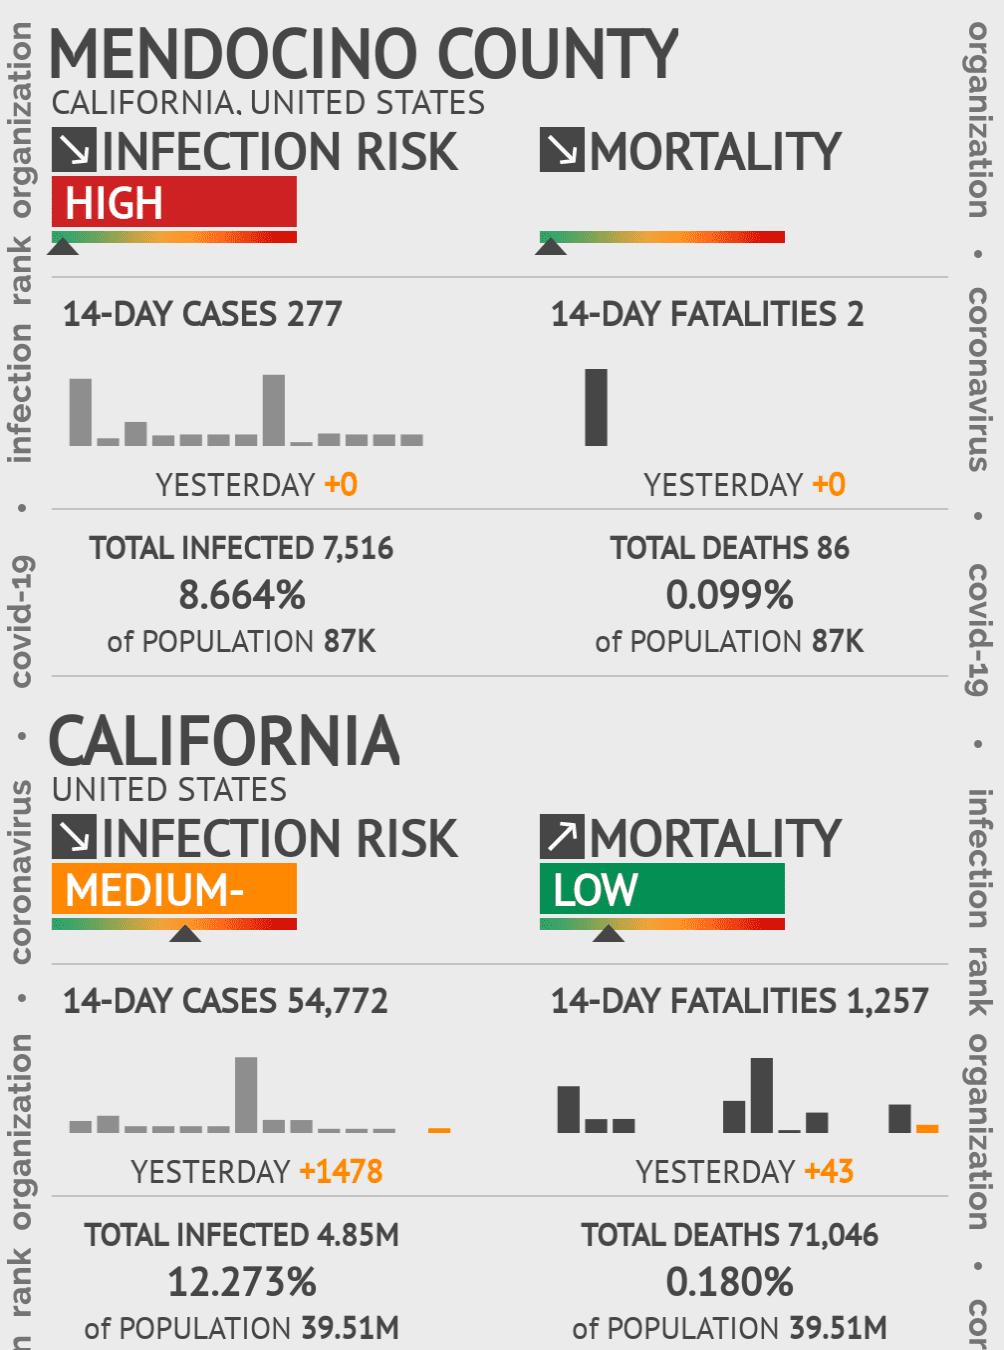 Mendocino County Coronavirus Covid-19 Risk of Infection on October 22, 2020